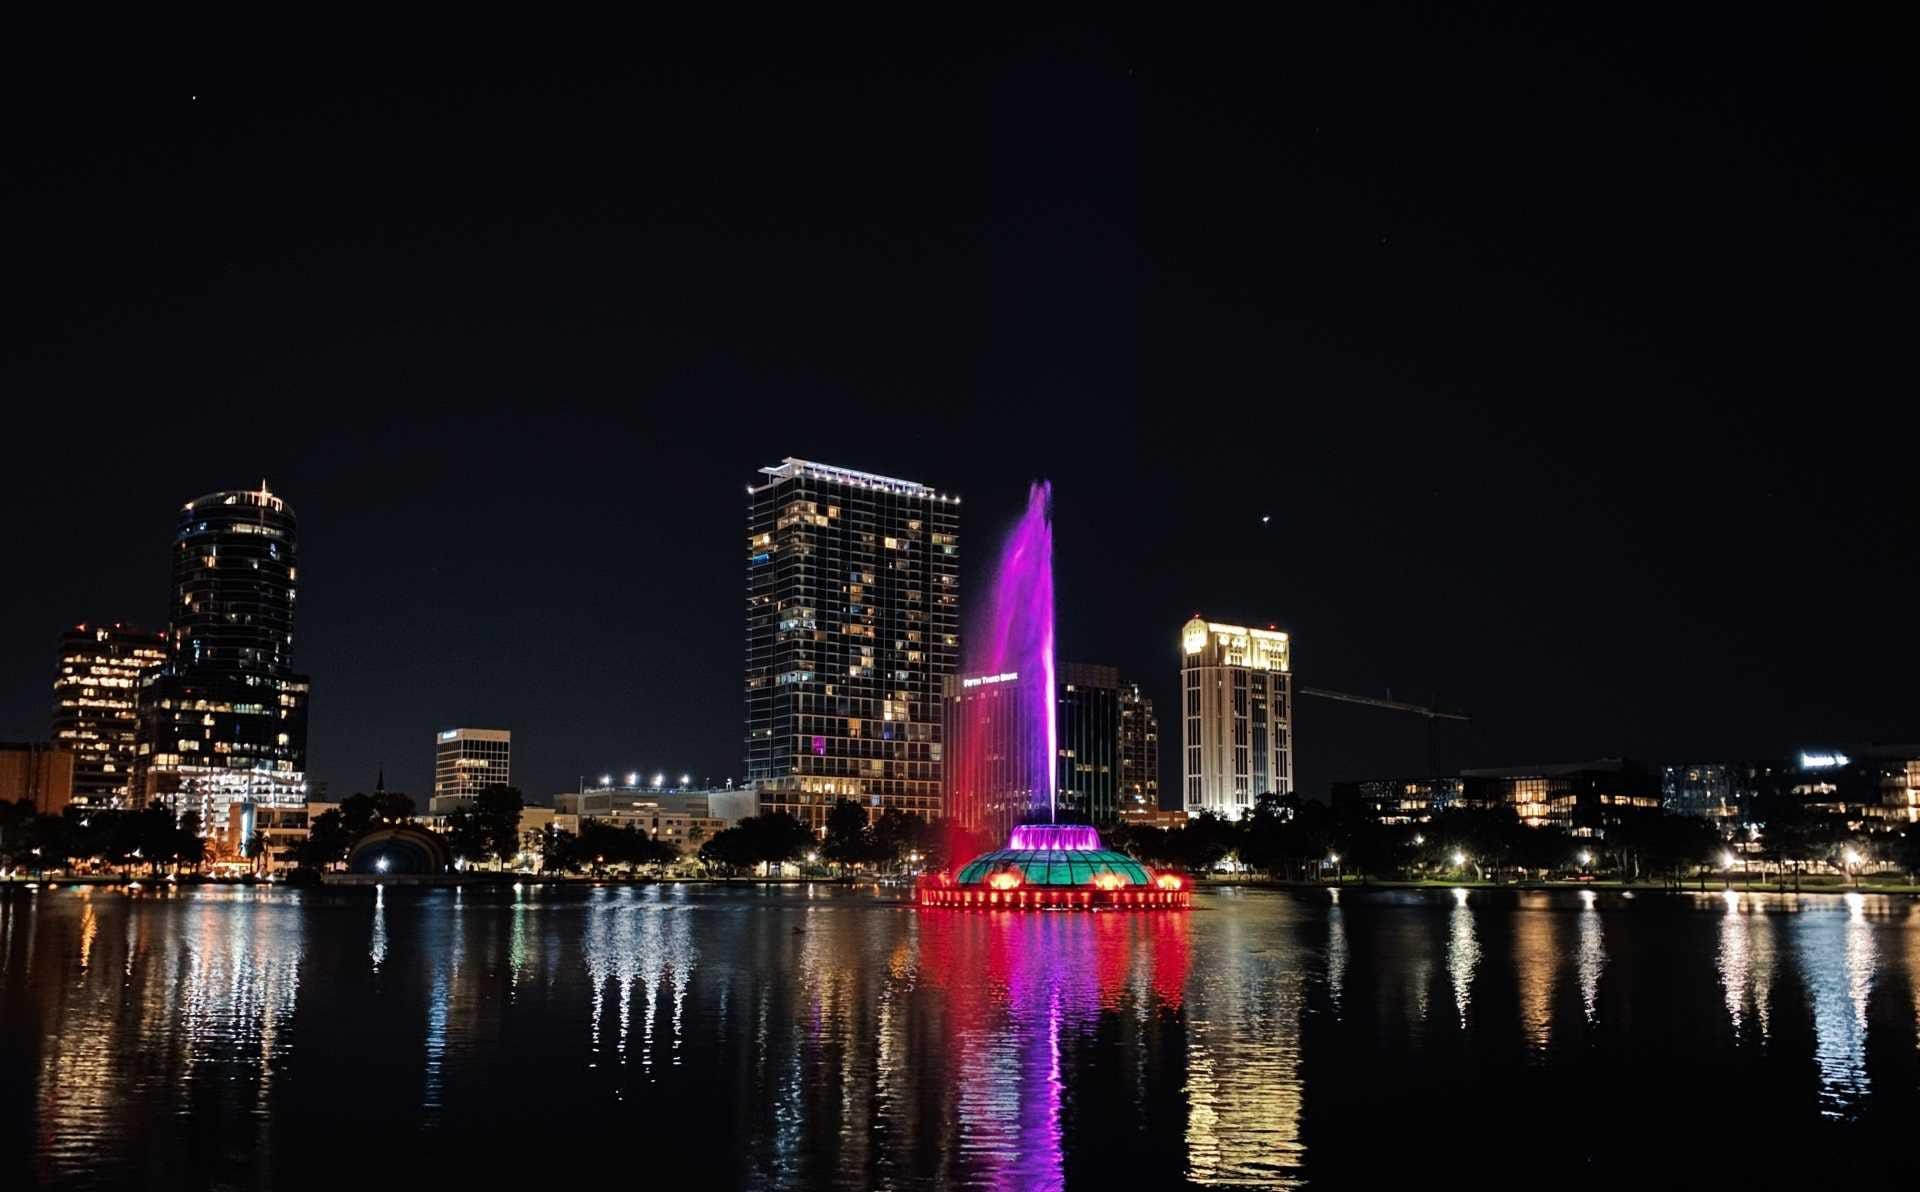 Orlando image